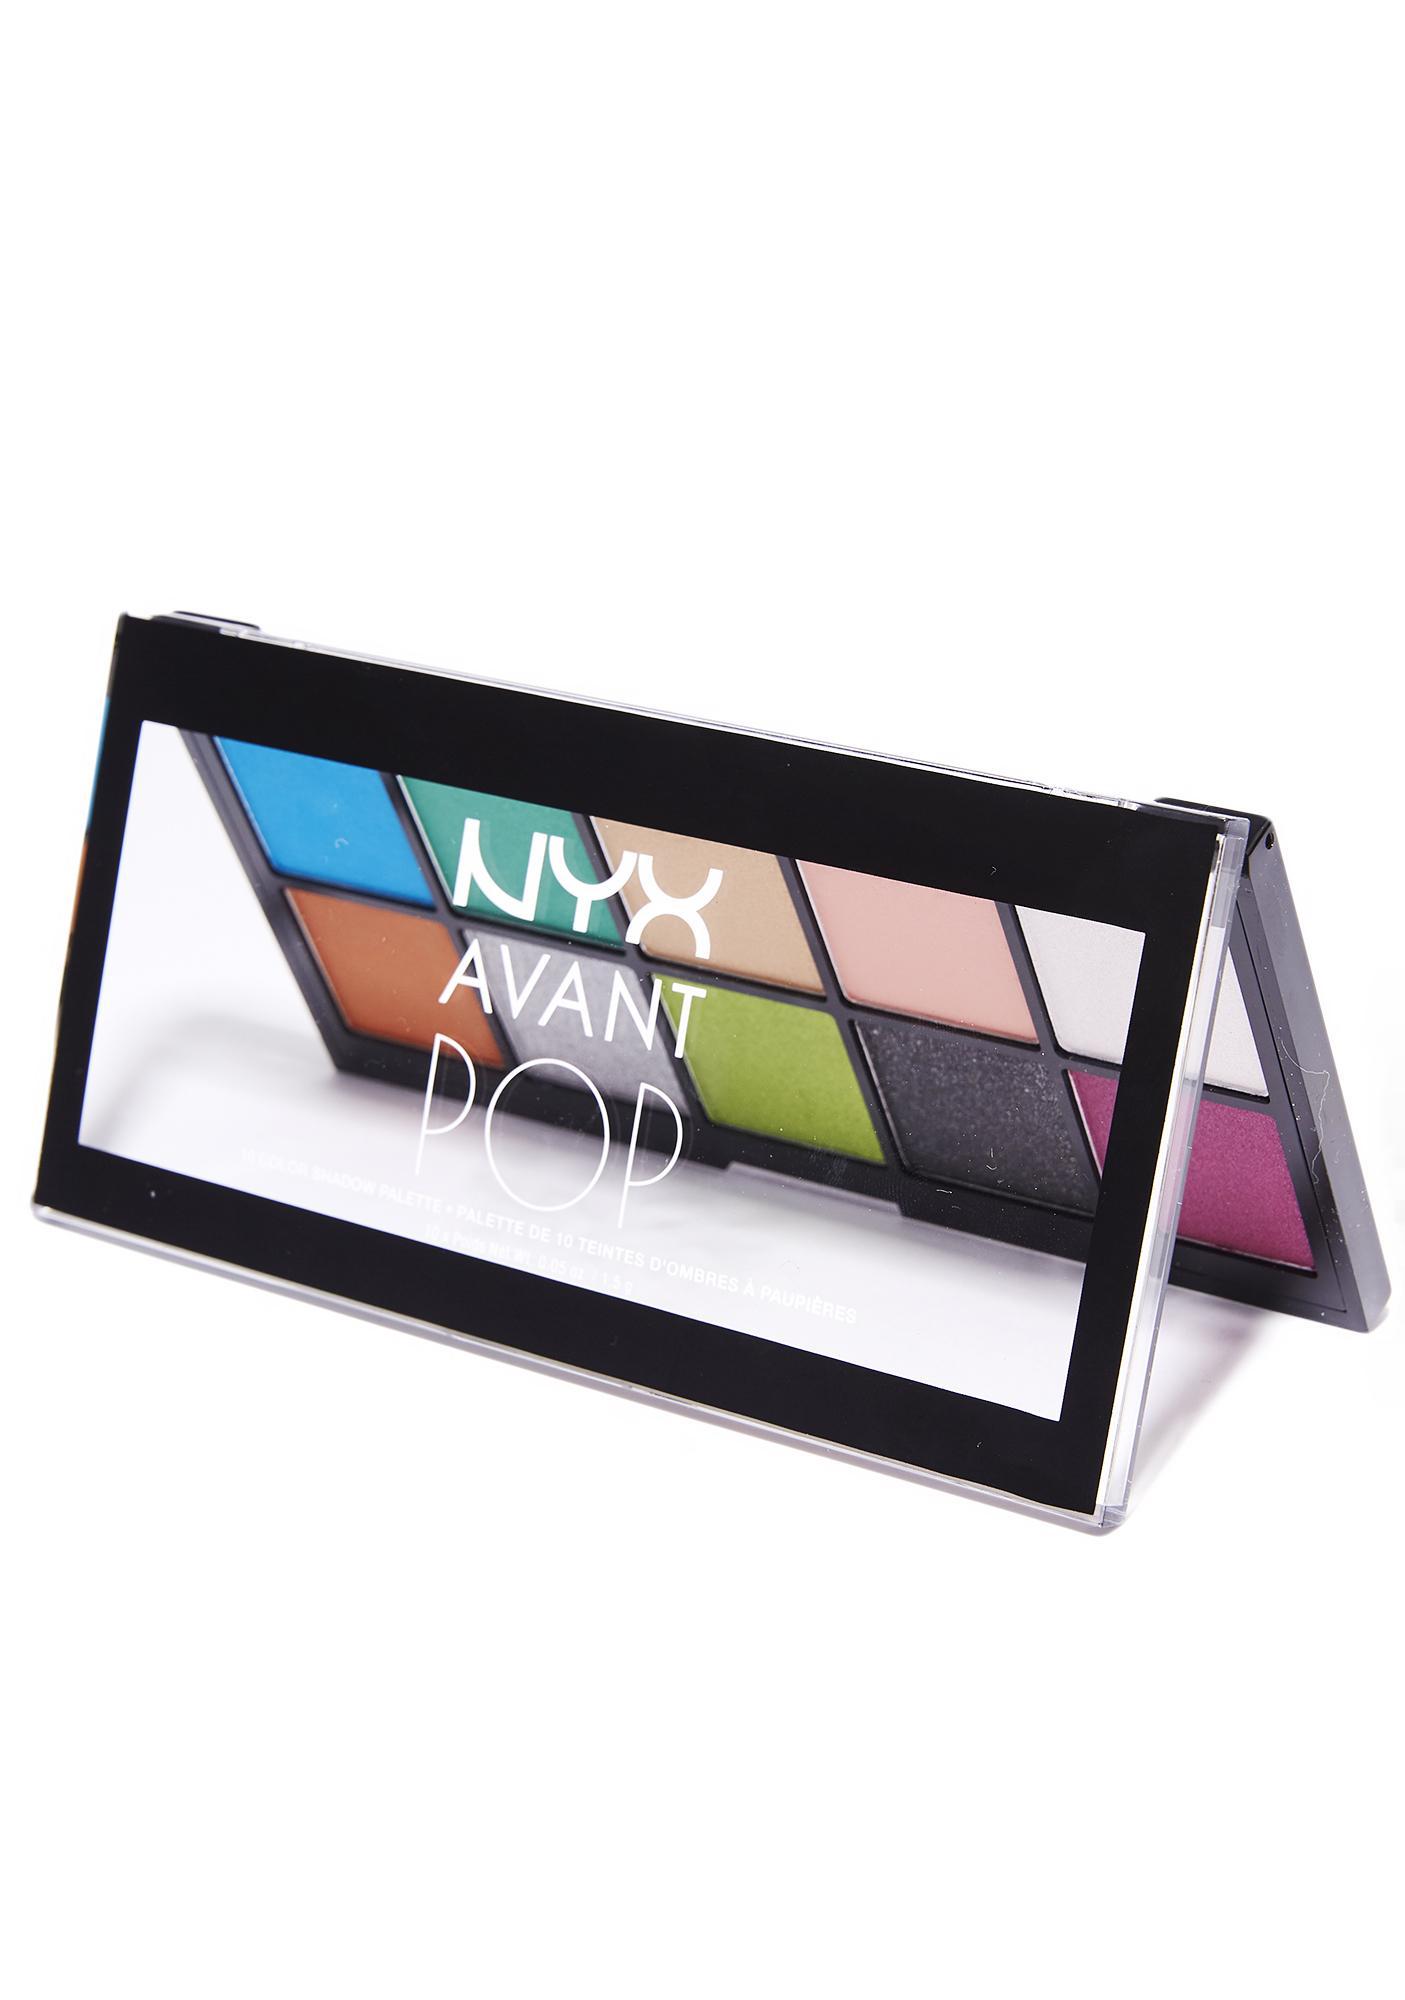 NYX Avant Pop Palette